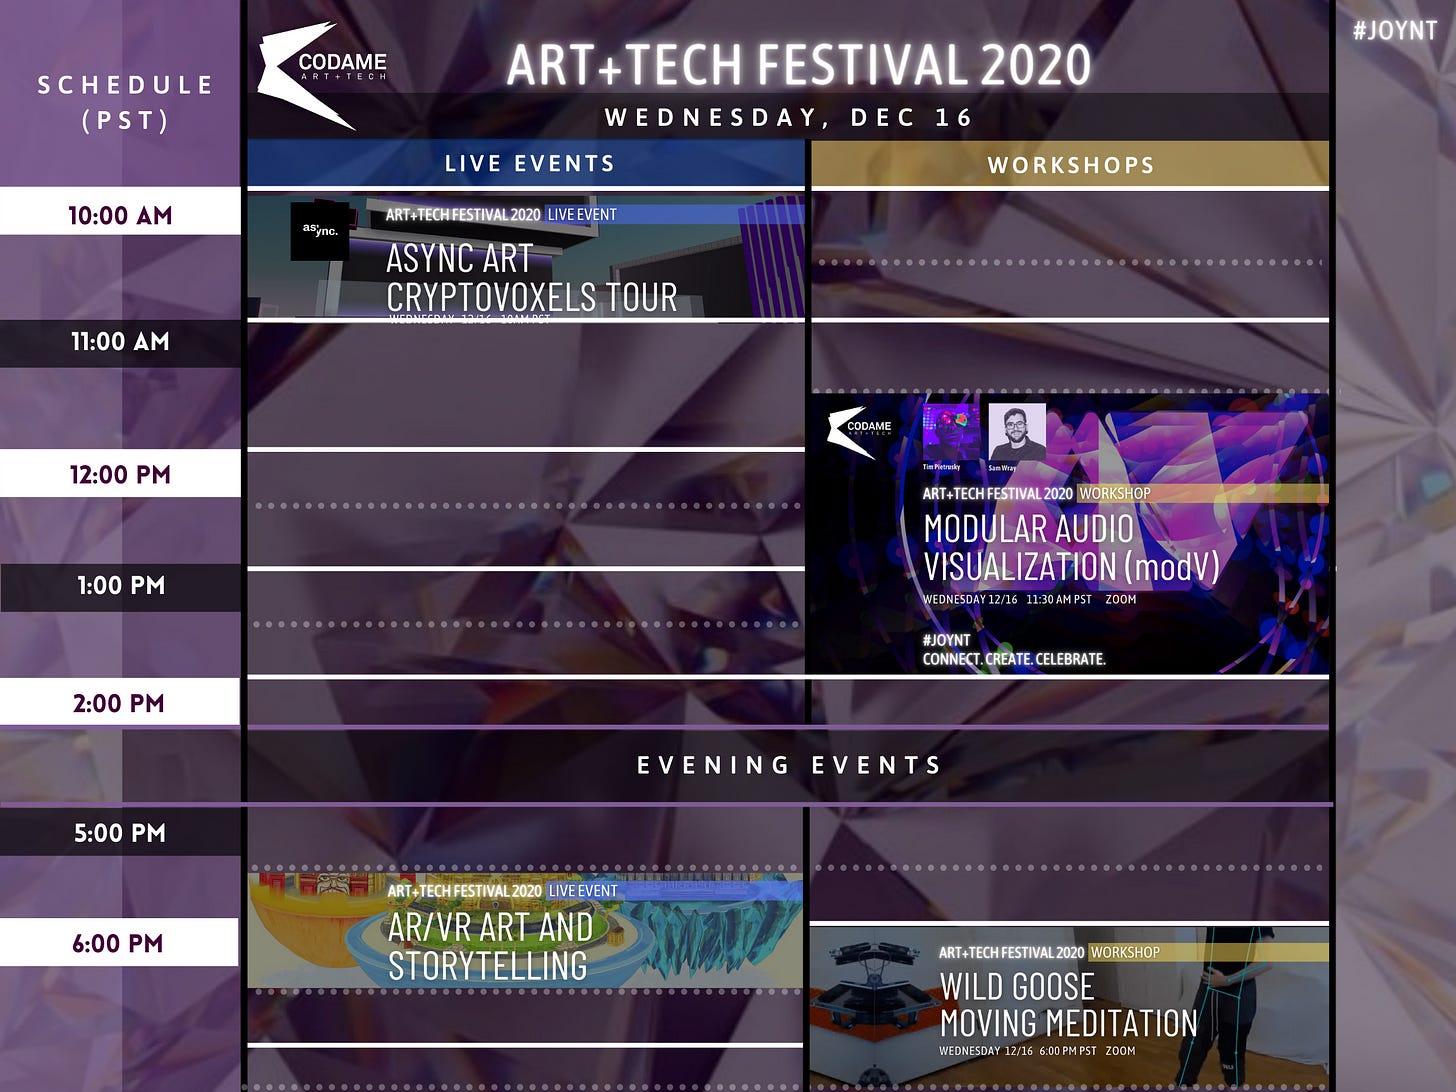 DAY 6: ART+TECH Festival 2020『 JOYNT 』